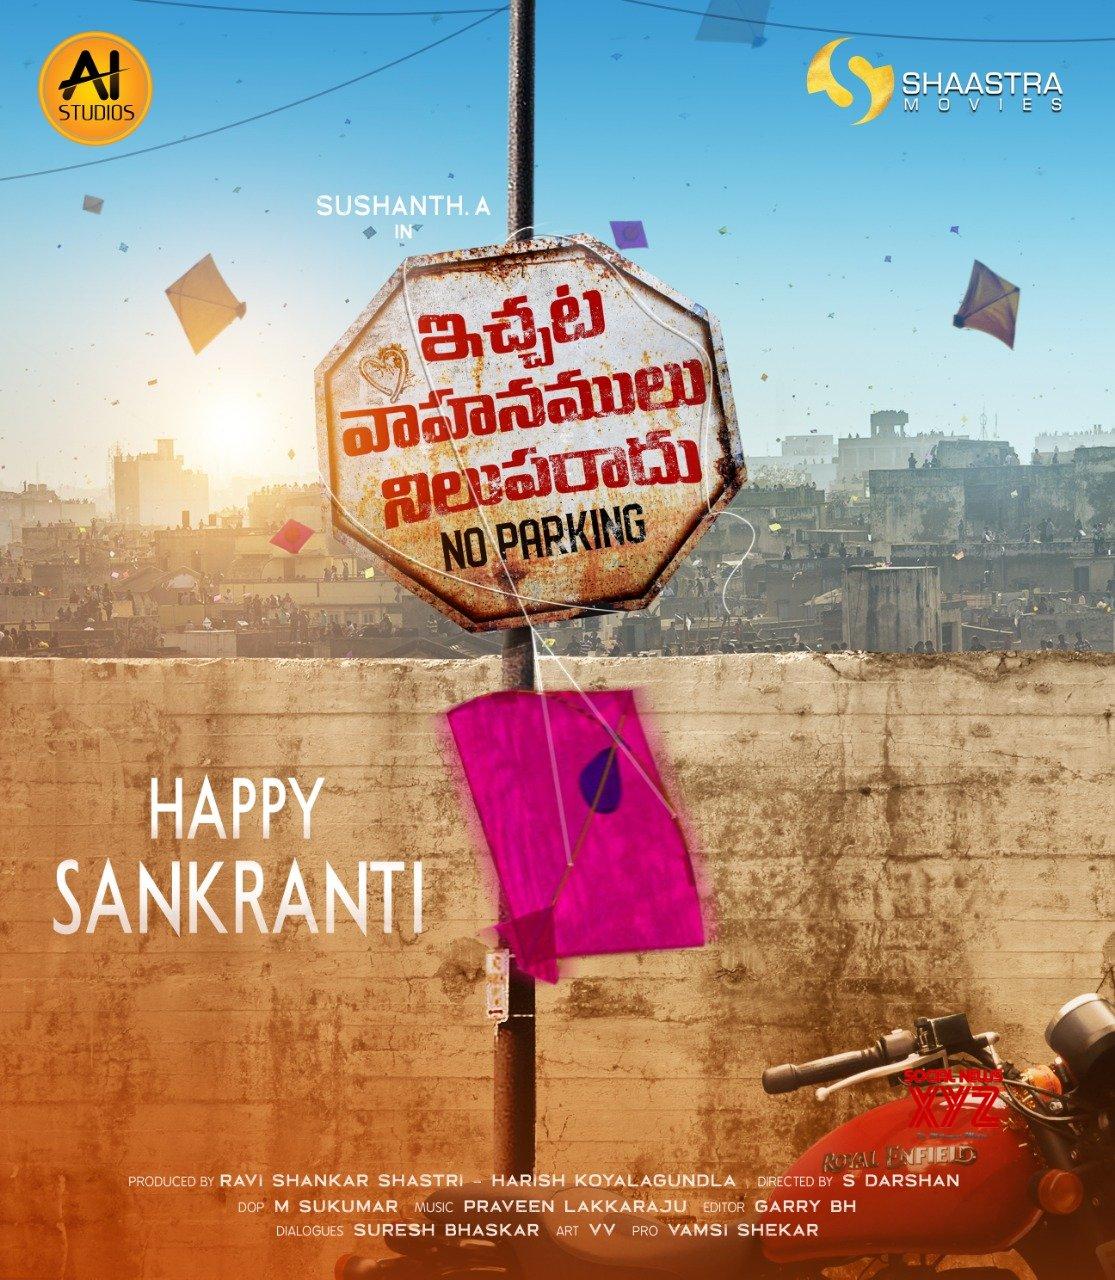 Ichata Vahanumulu Nilupa Radu Movie Sankranthi Poster